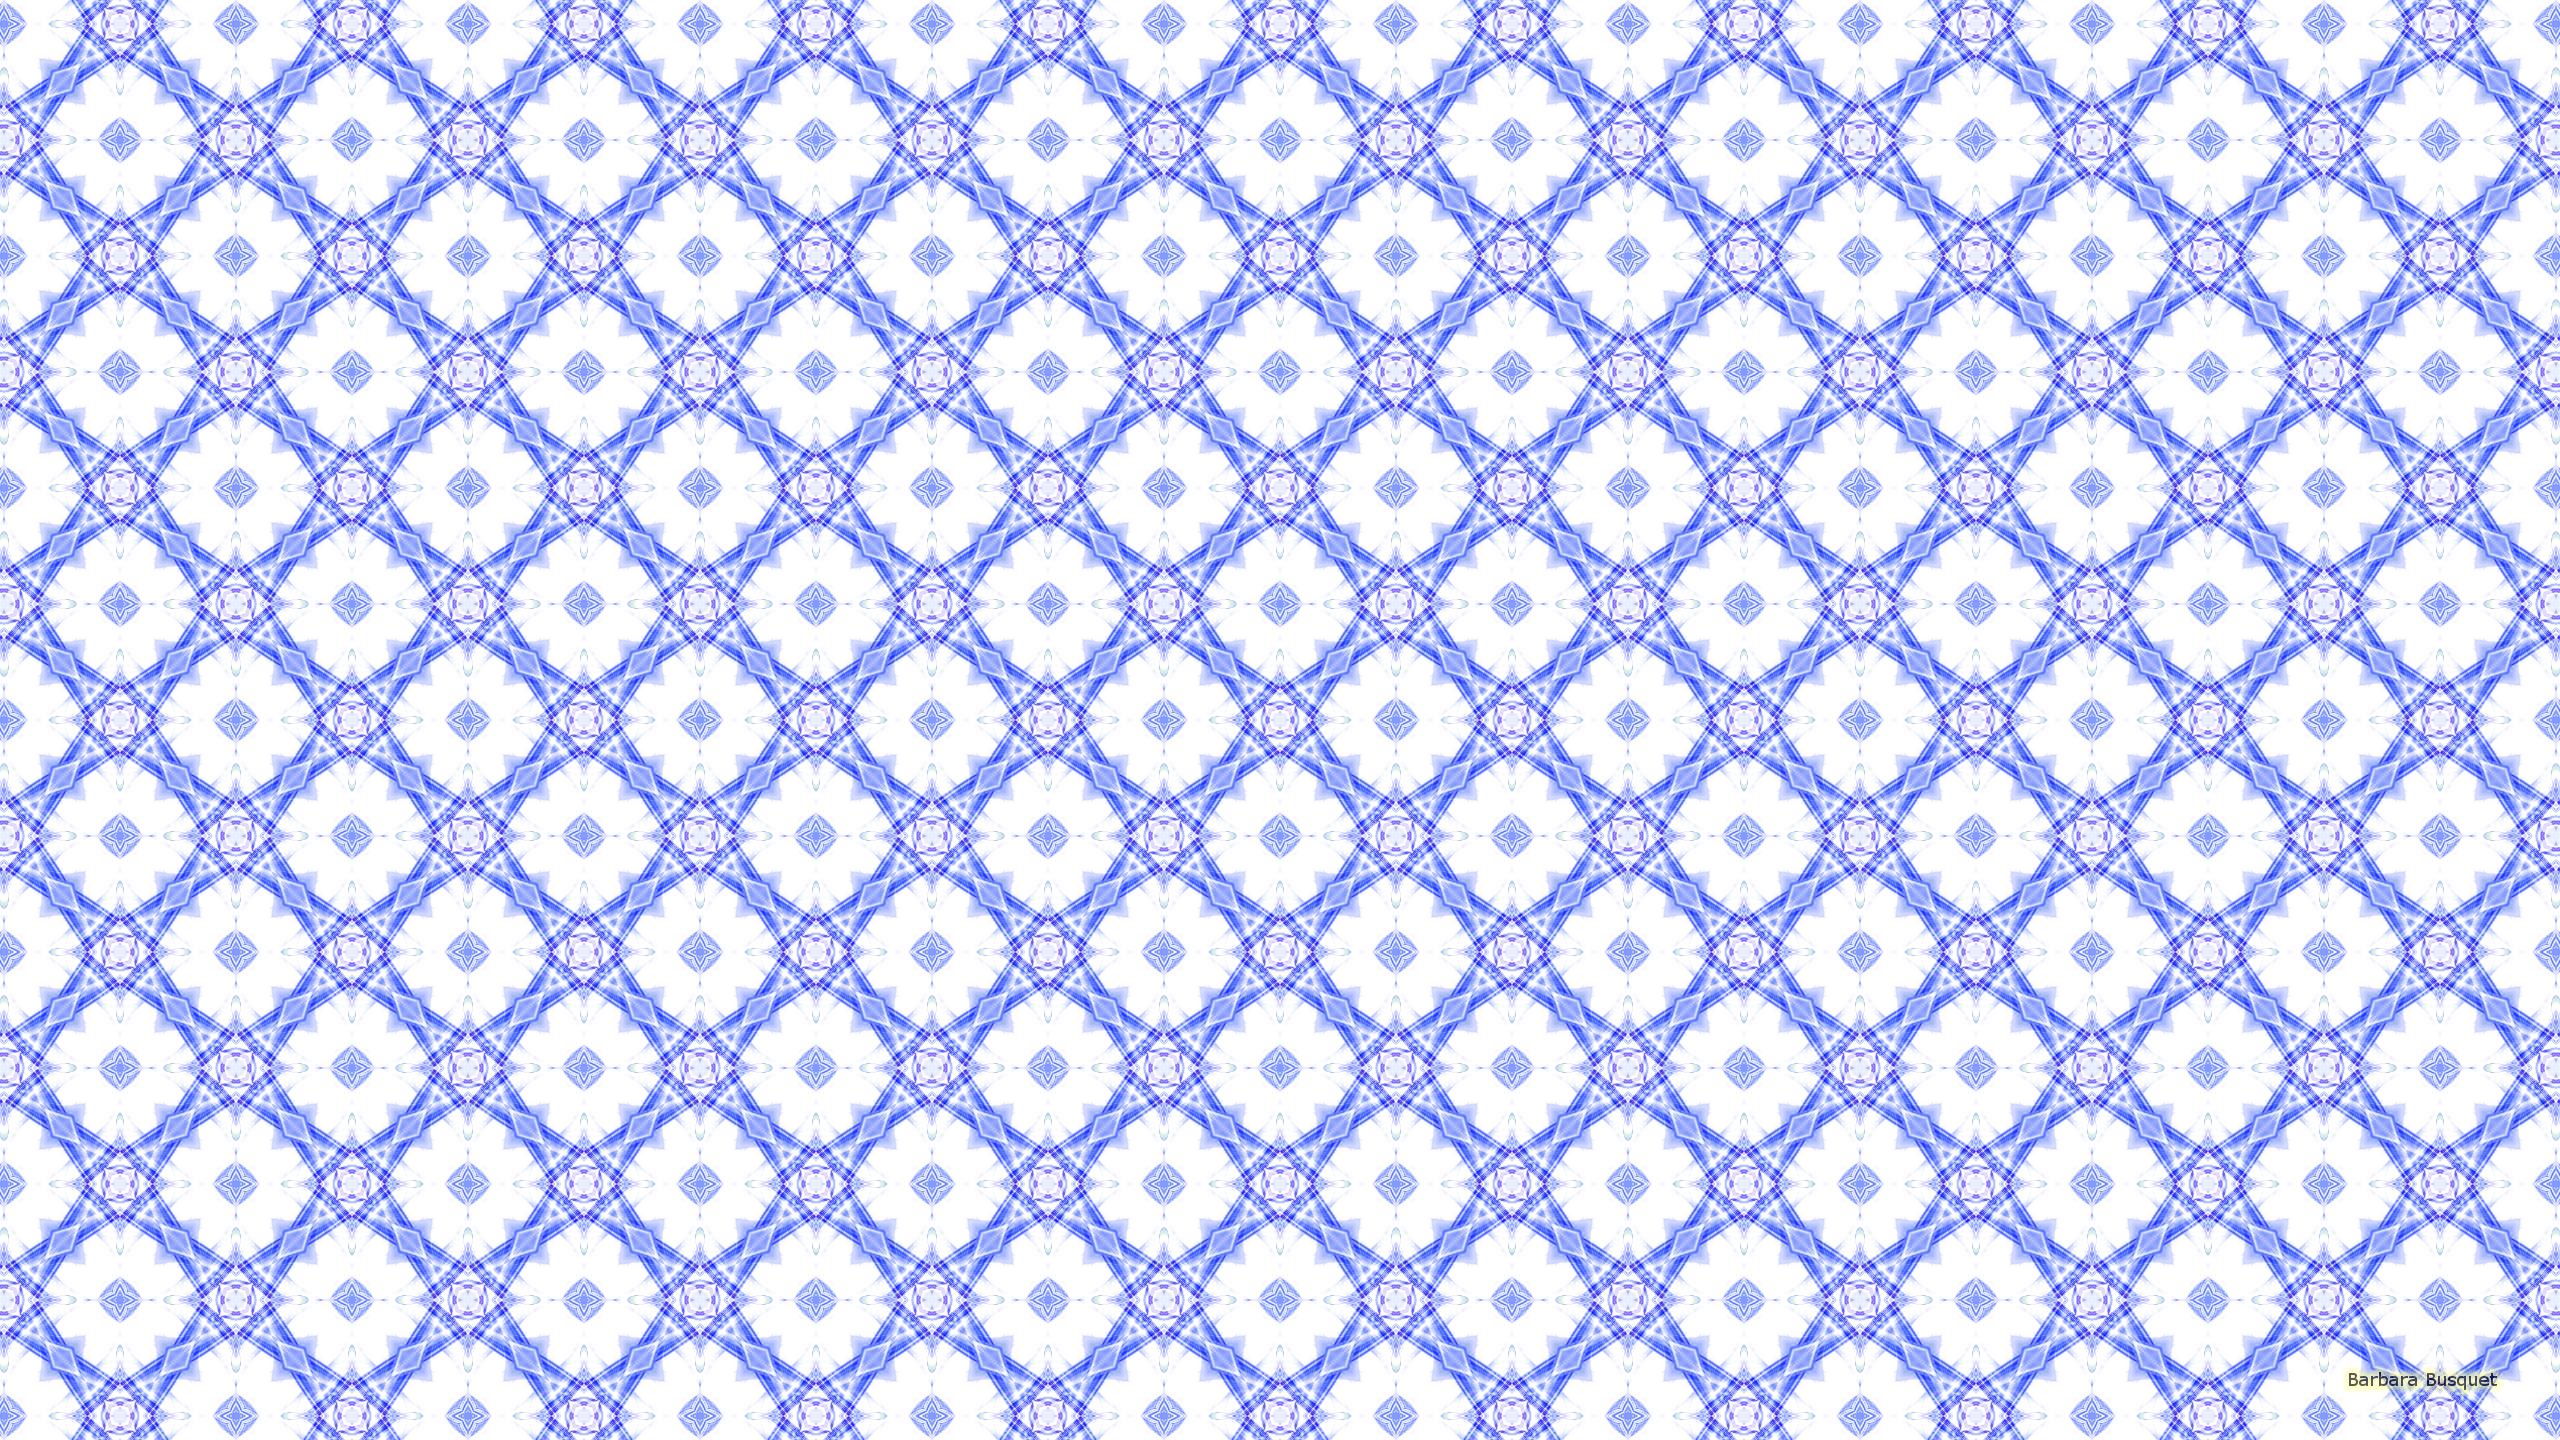 Unduh 1080+ Background Blue White Hd HD Terbaik